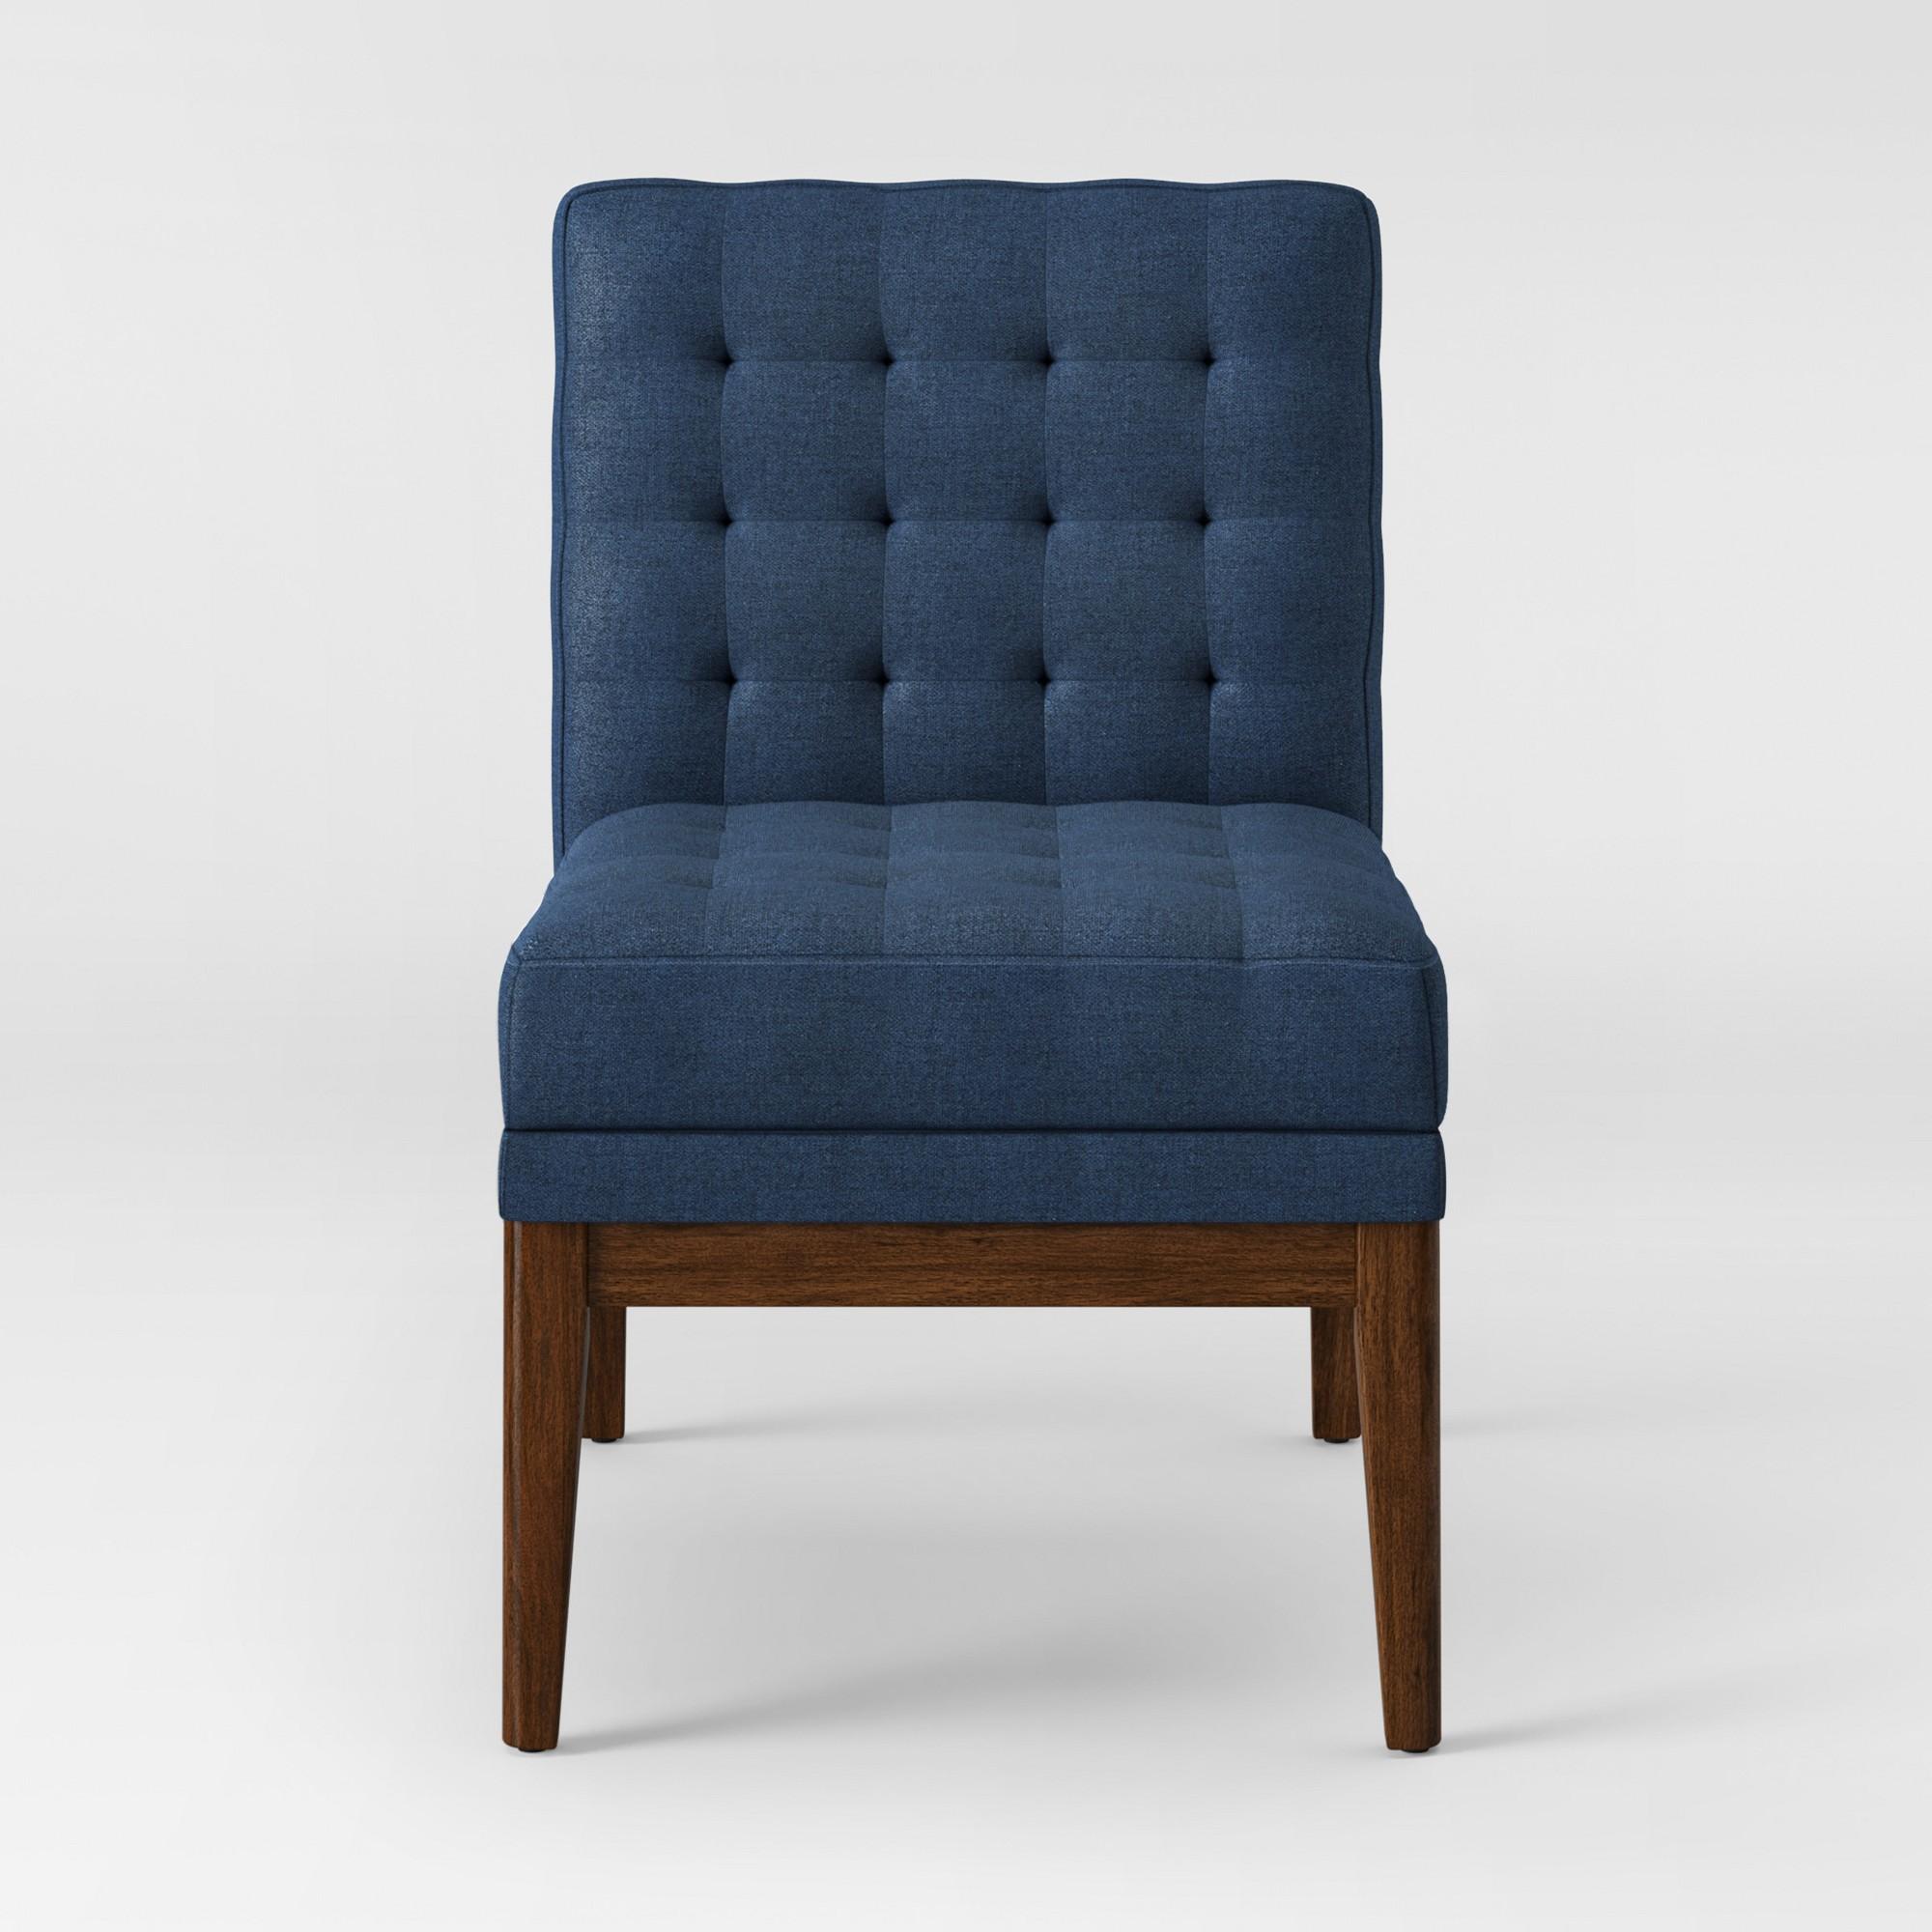 Prime Newark Tufted Slipper Chair With Wood Base Ships Flat Navy Evergreenethics Interior Chair Design Evergreenethicsorg